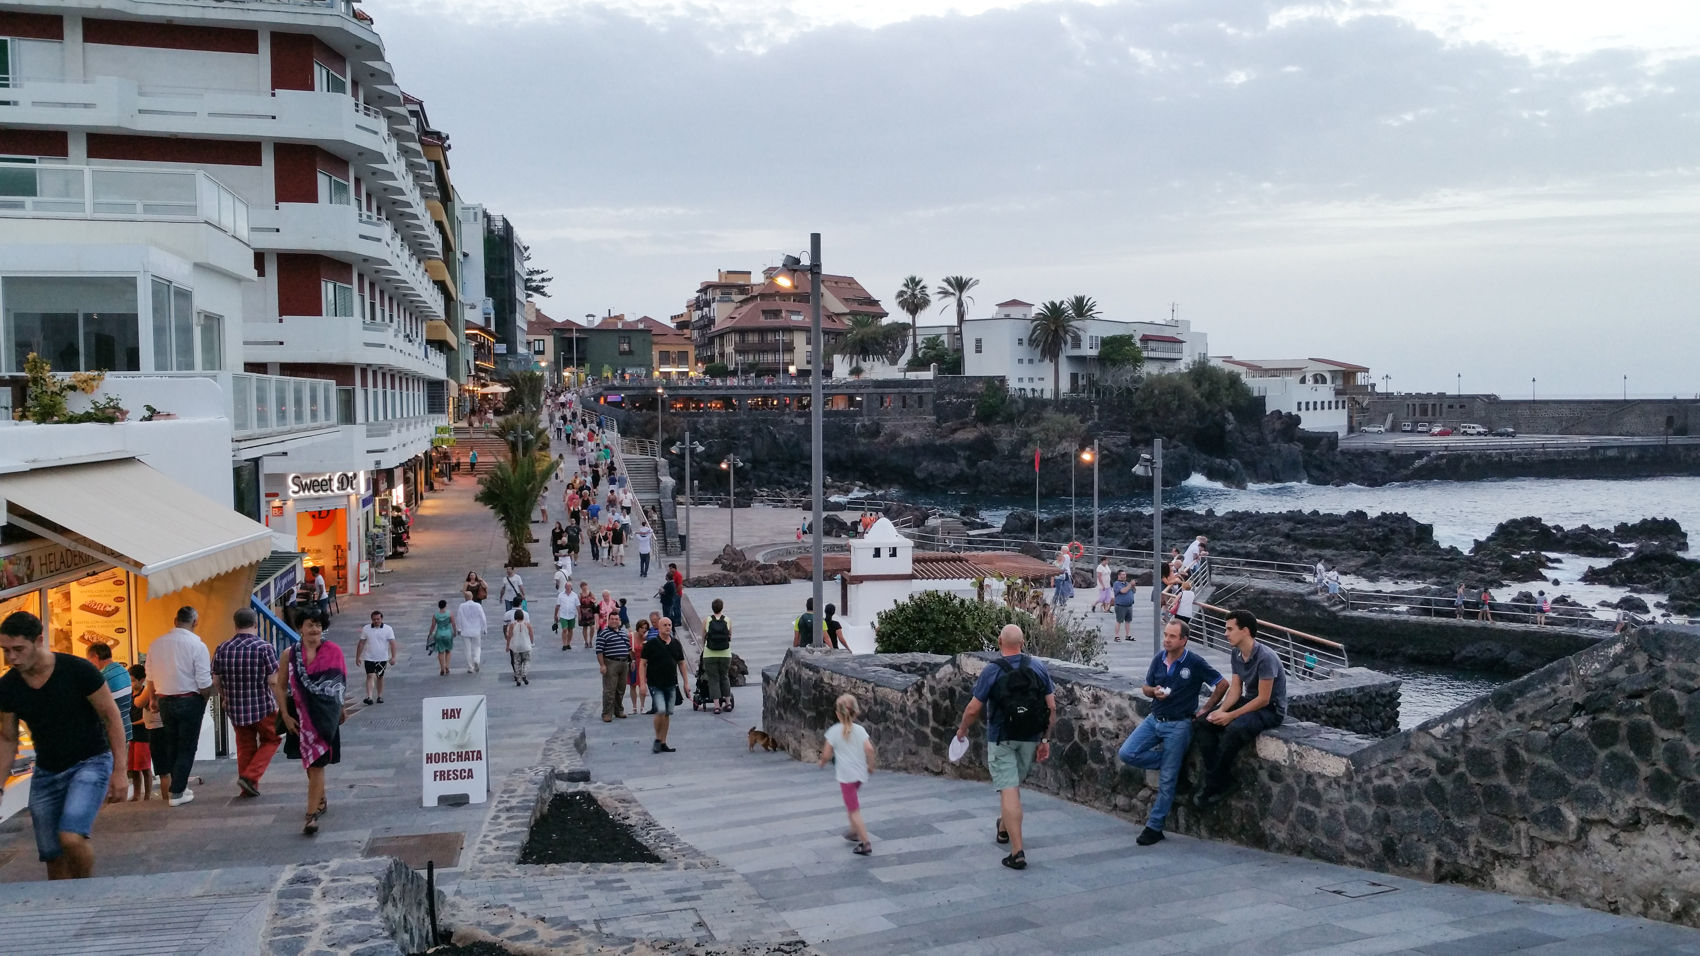 Faqs h ufig gestellte fragen rund um puerto de la cruz - Puerto de la cruz sehenswurdigkeiten ...